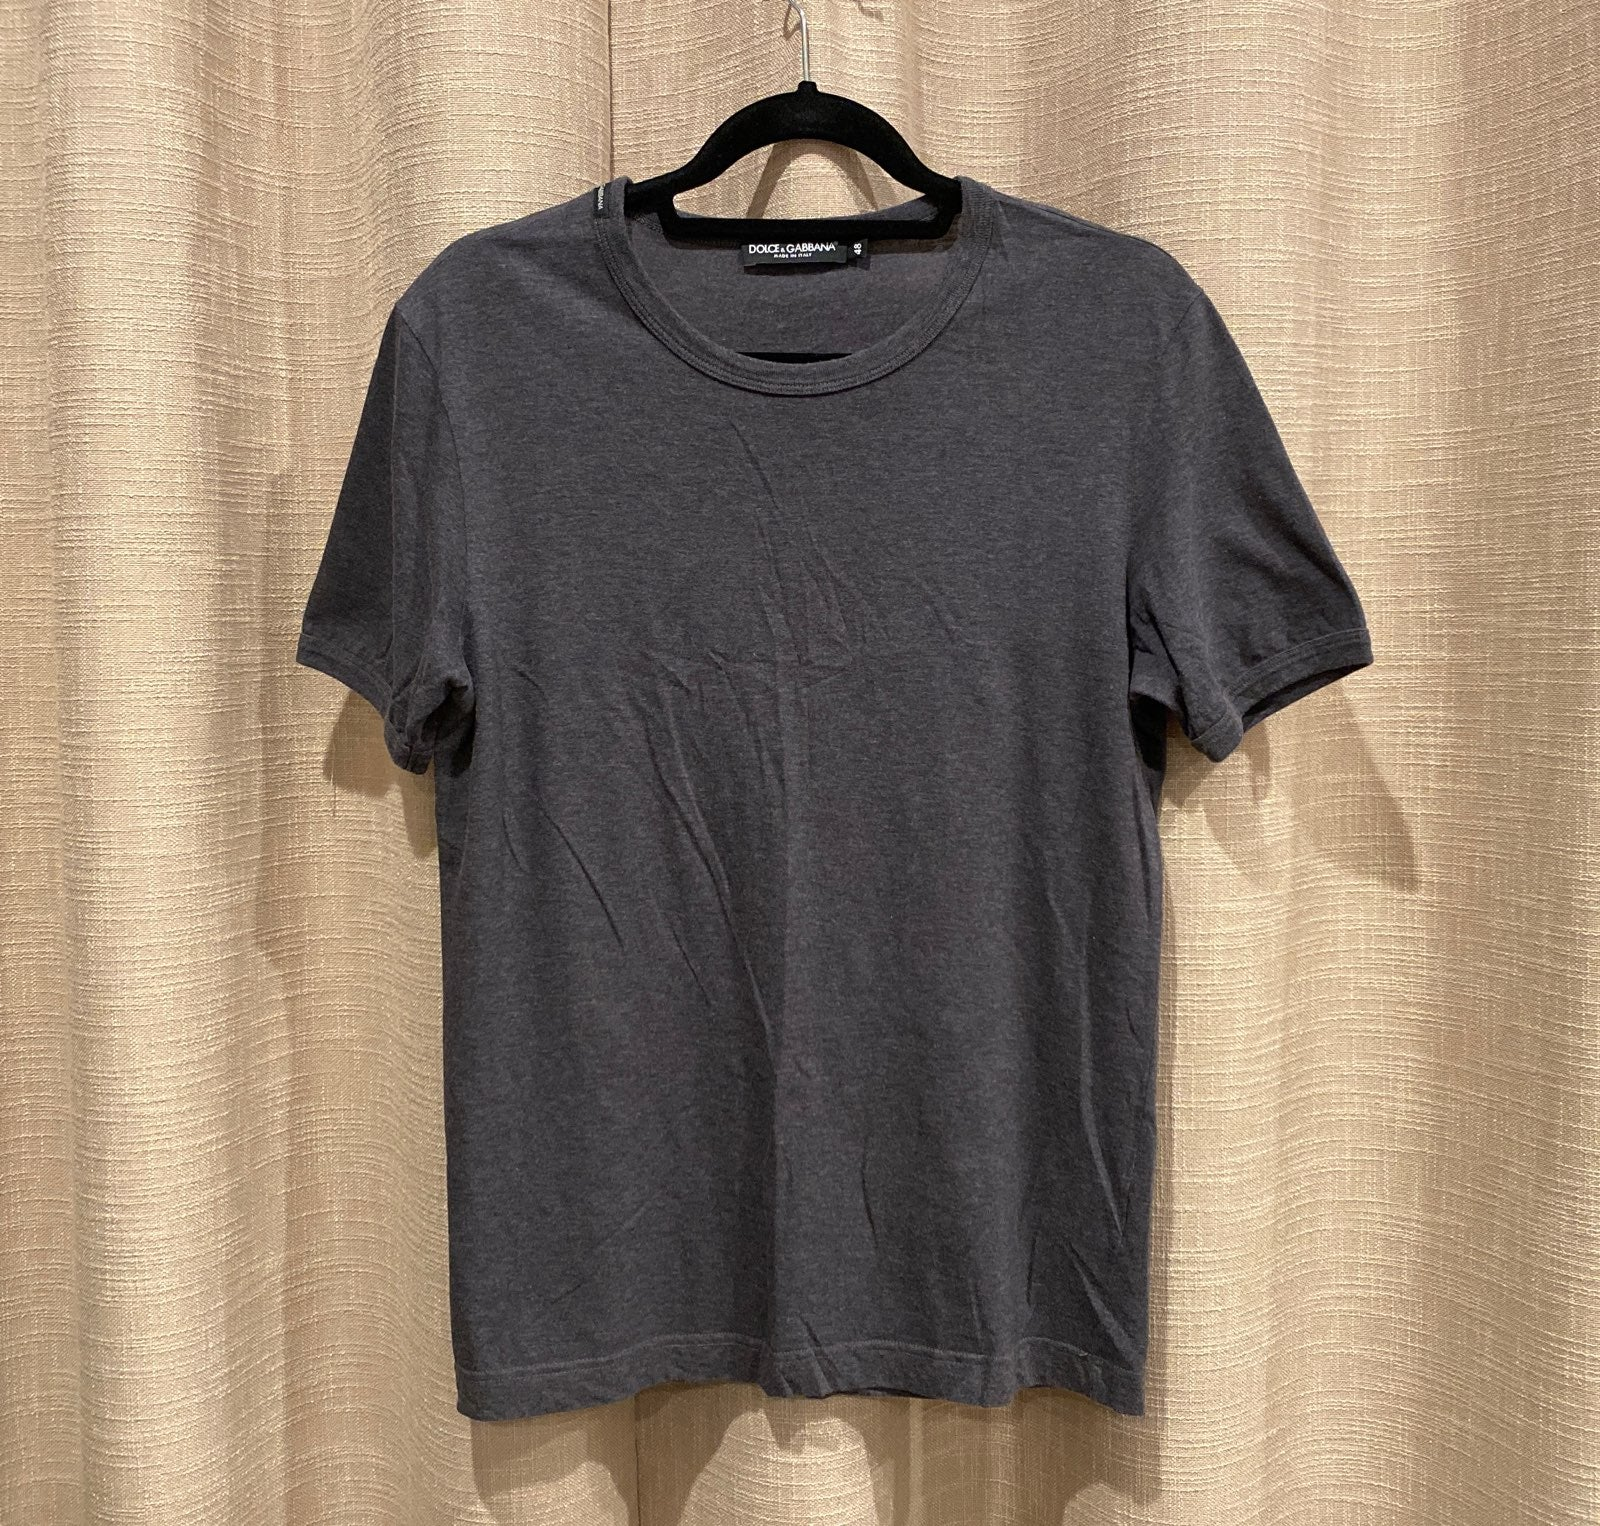 Dolce and Gabbana men's tshirt